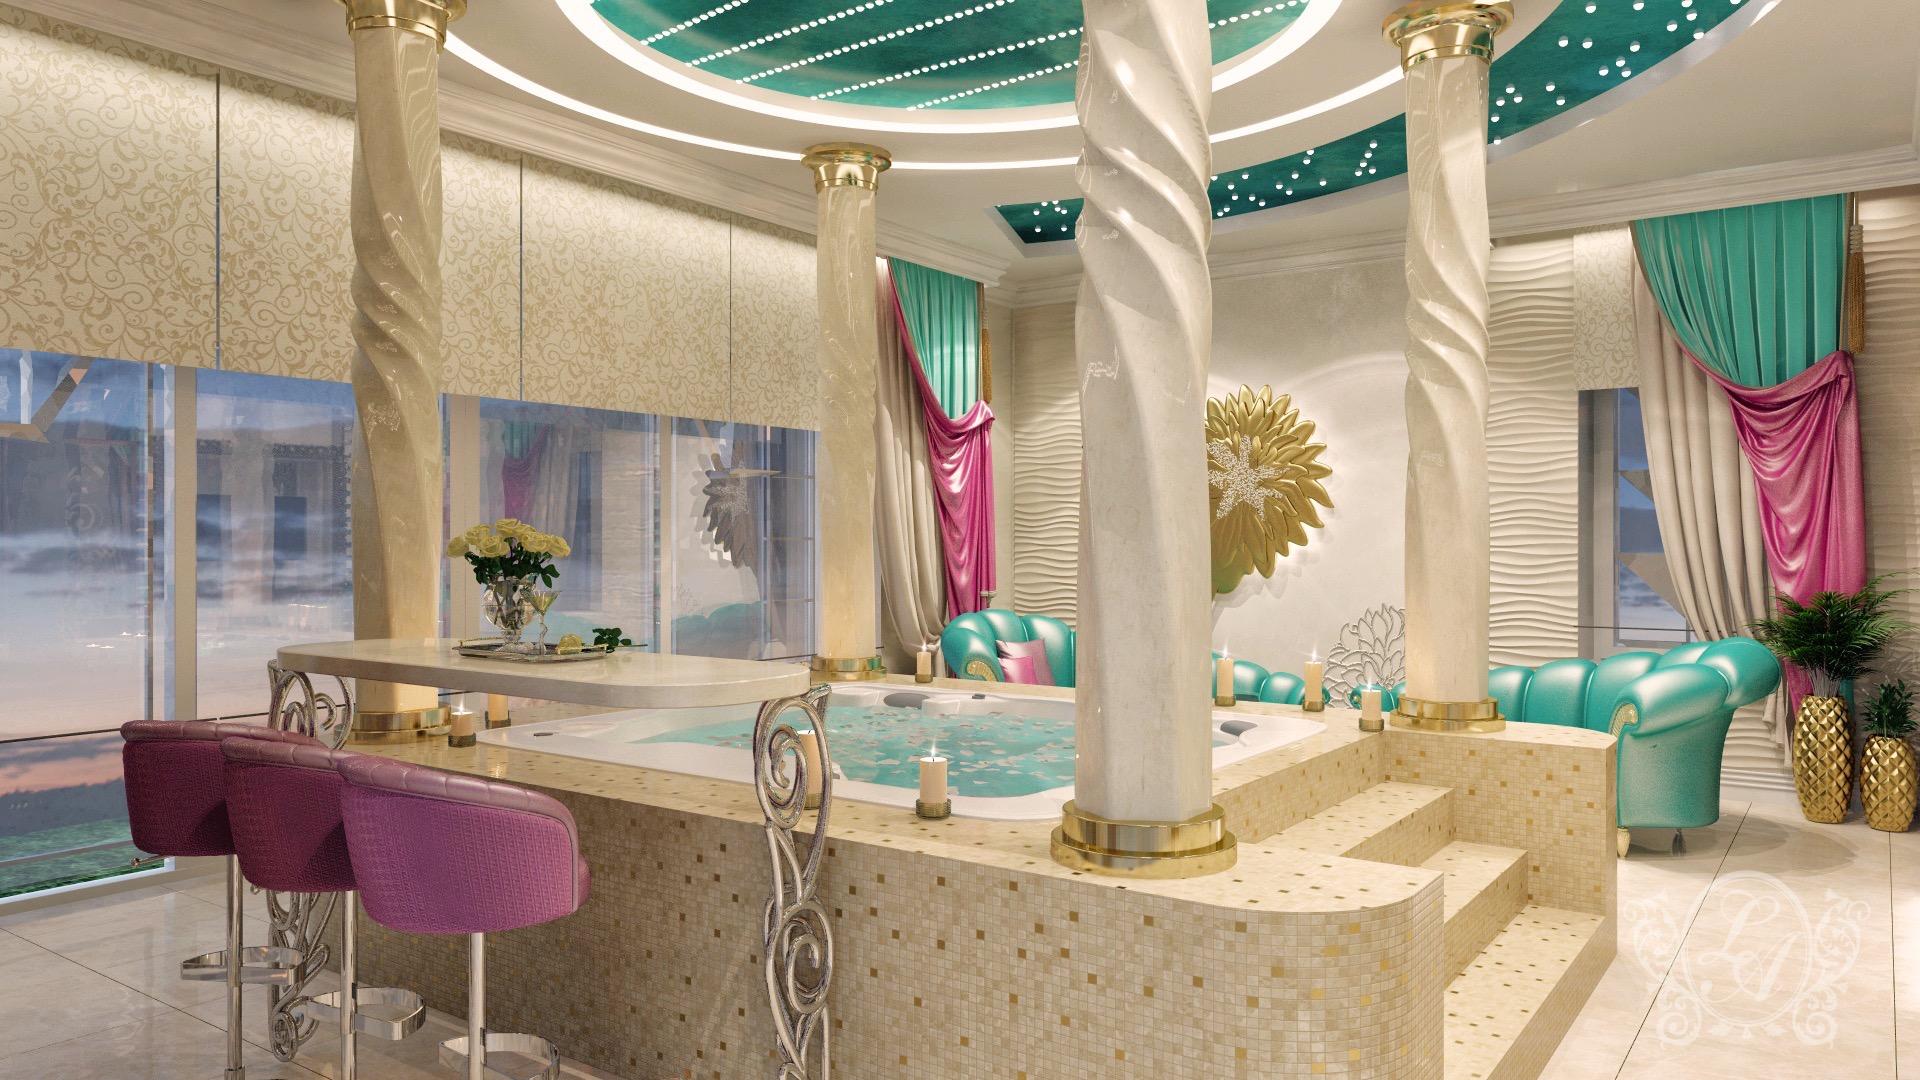 luxurious_private_spa_01.jpg